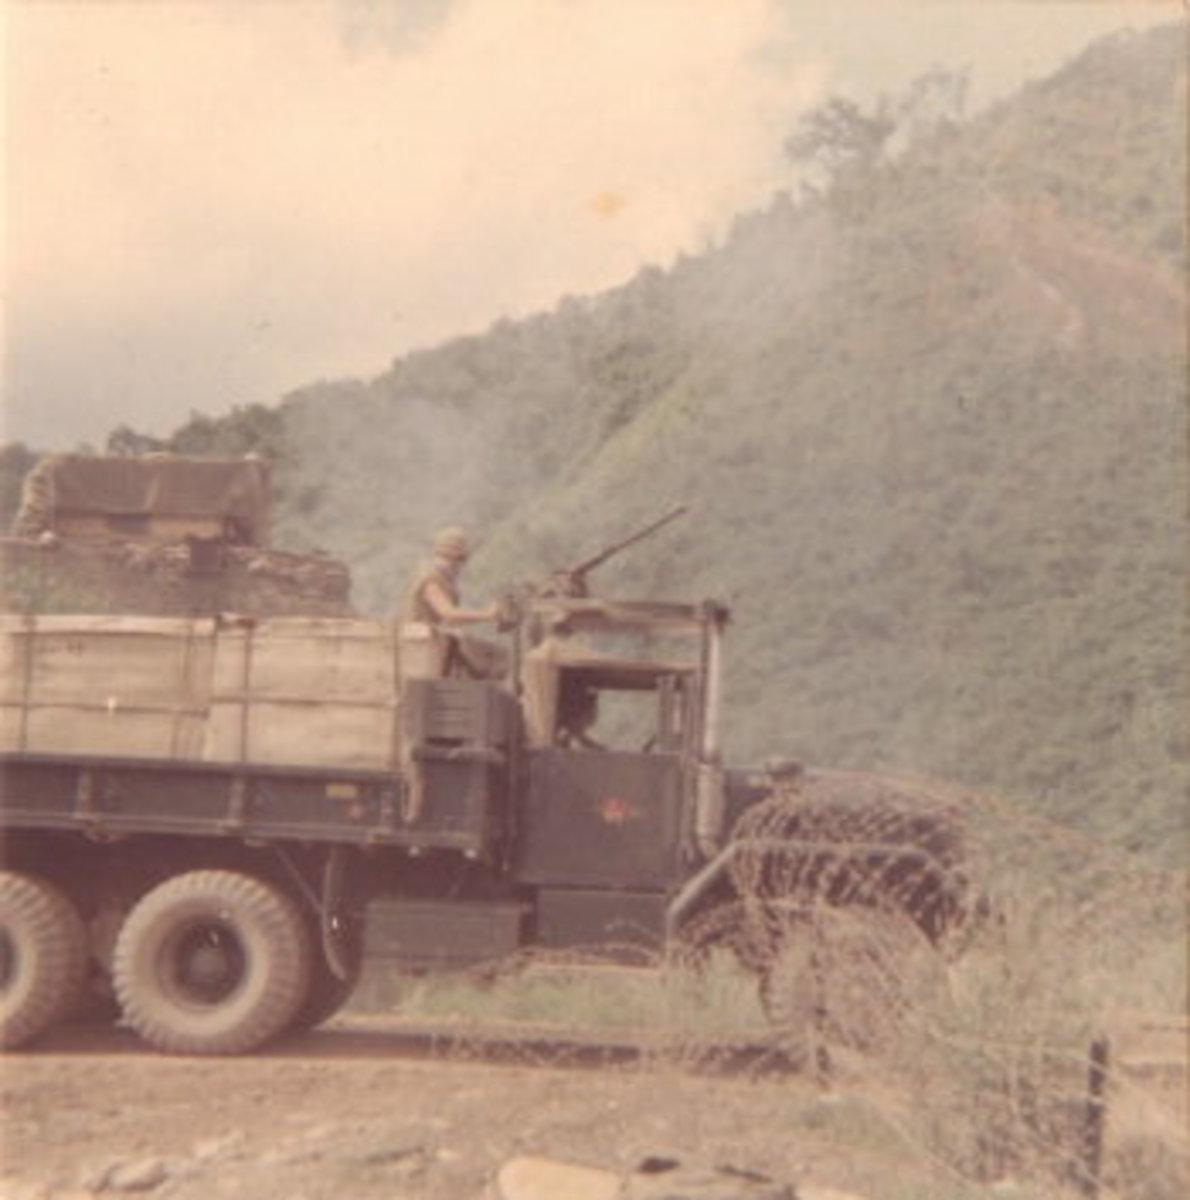 vietnam-1968-1969-or-was-it-yesterday